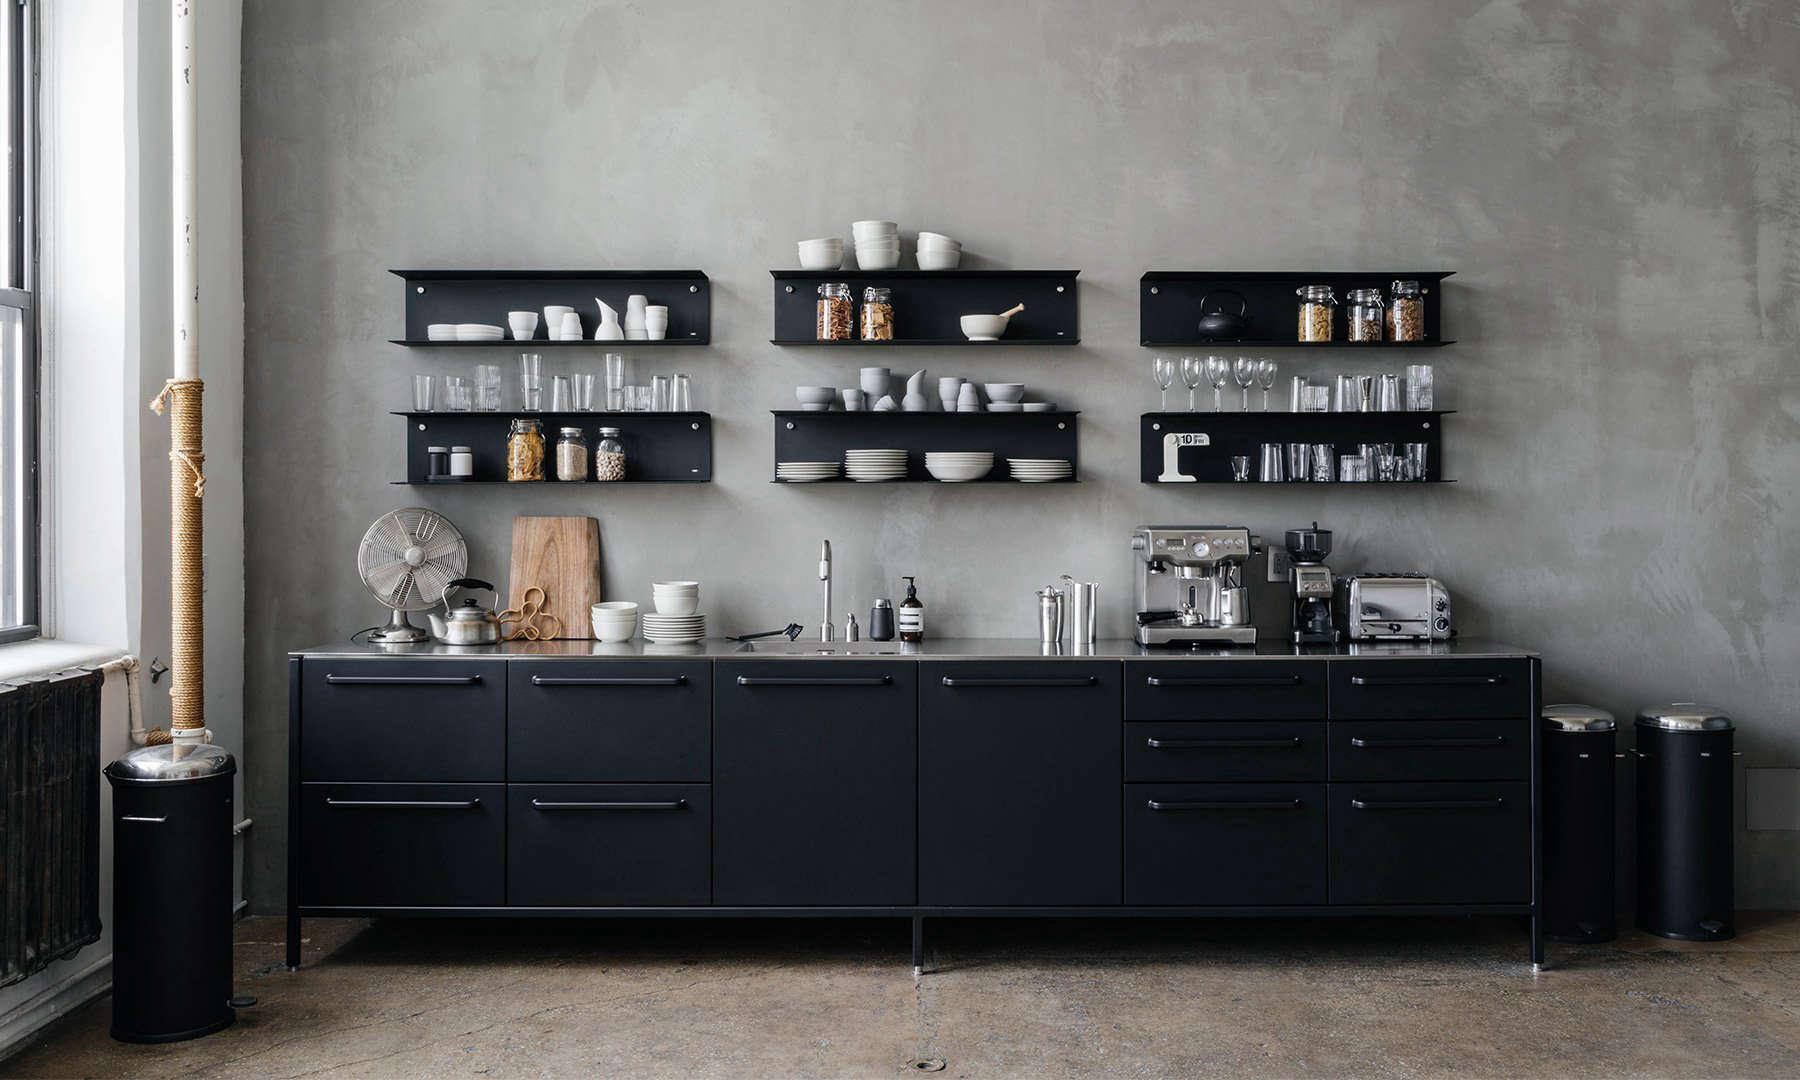 Trend Alert 8 Companies Designing Modular Kitchen Components Remodelista